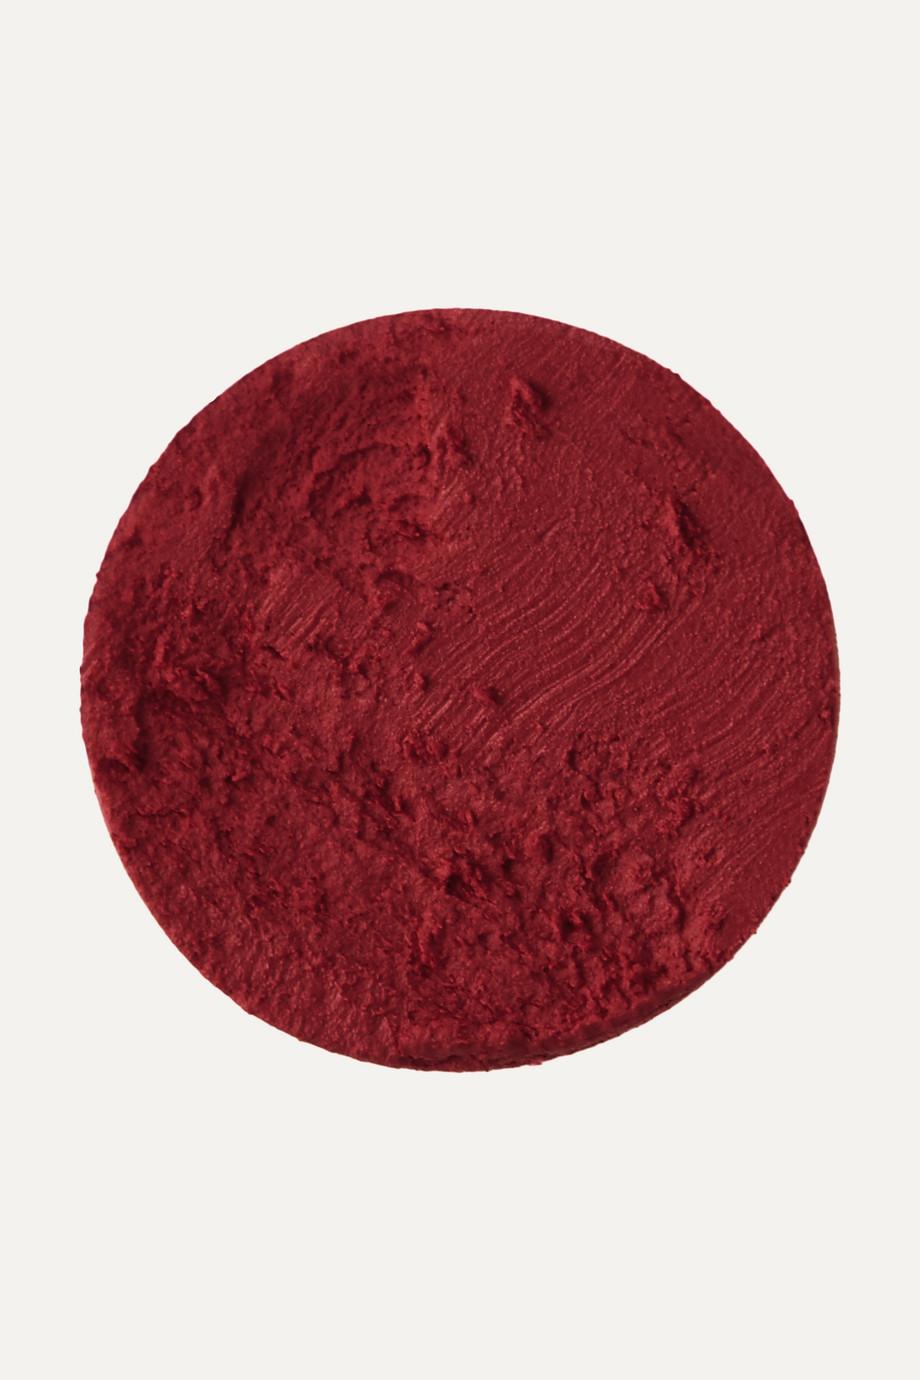 Pat McGrath Labs MatteTrance Lipstick - Elson